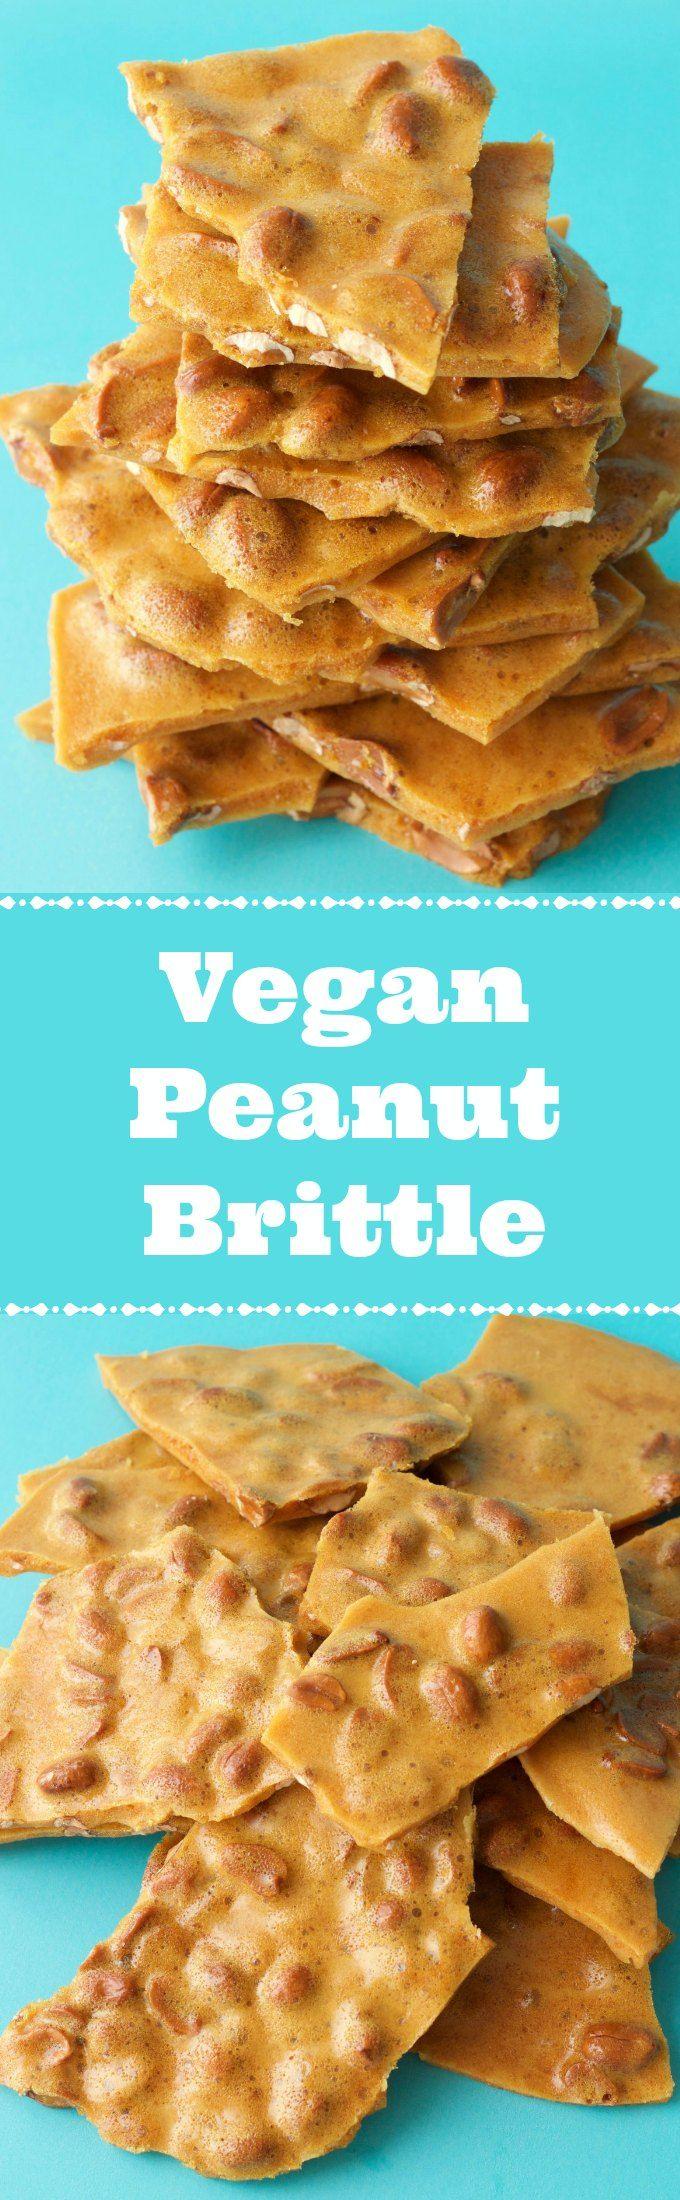 Vegan Peanut Brittle. Deliciously sweet and crunchy. Wonderful as a dessert or snack. Vegan | Vegan Desserts | Gluten-Free | Gluten Free Vegan | Dairy Free | Vegan Recipes | Vegan Candy